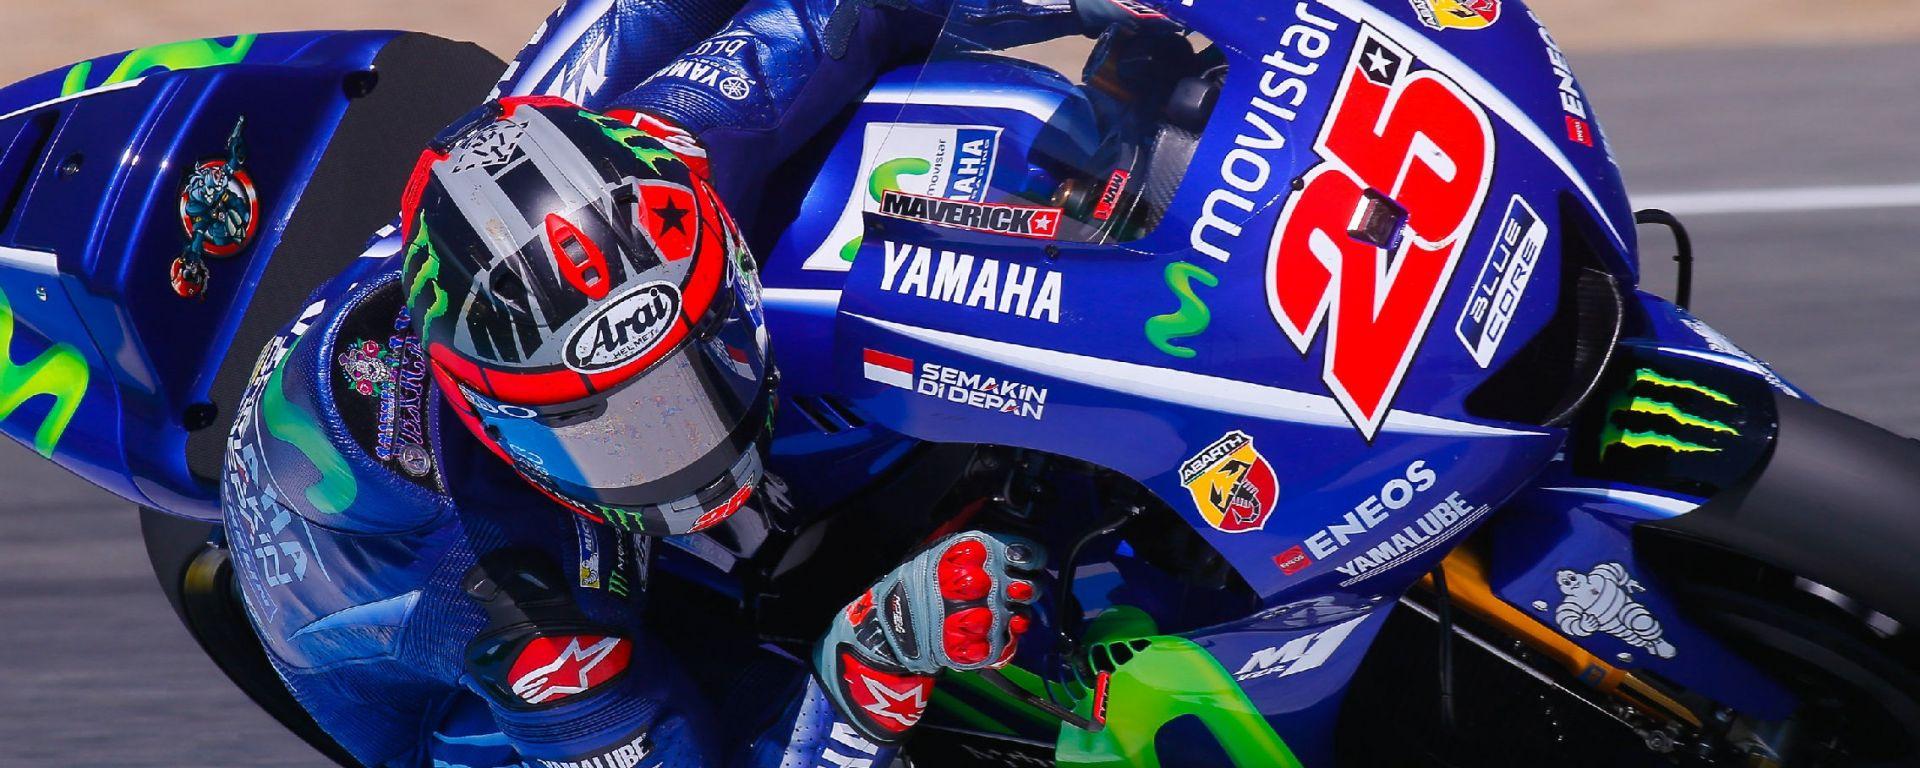 Test MotoGP Jerez 2017: solo 2 millesimi tra Vinales e Marquez, Sale l'Aprilia con Espargarò, Rossi ventunesimo